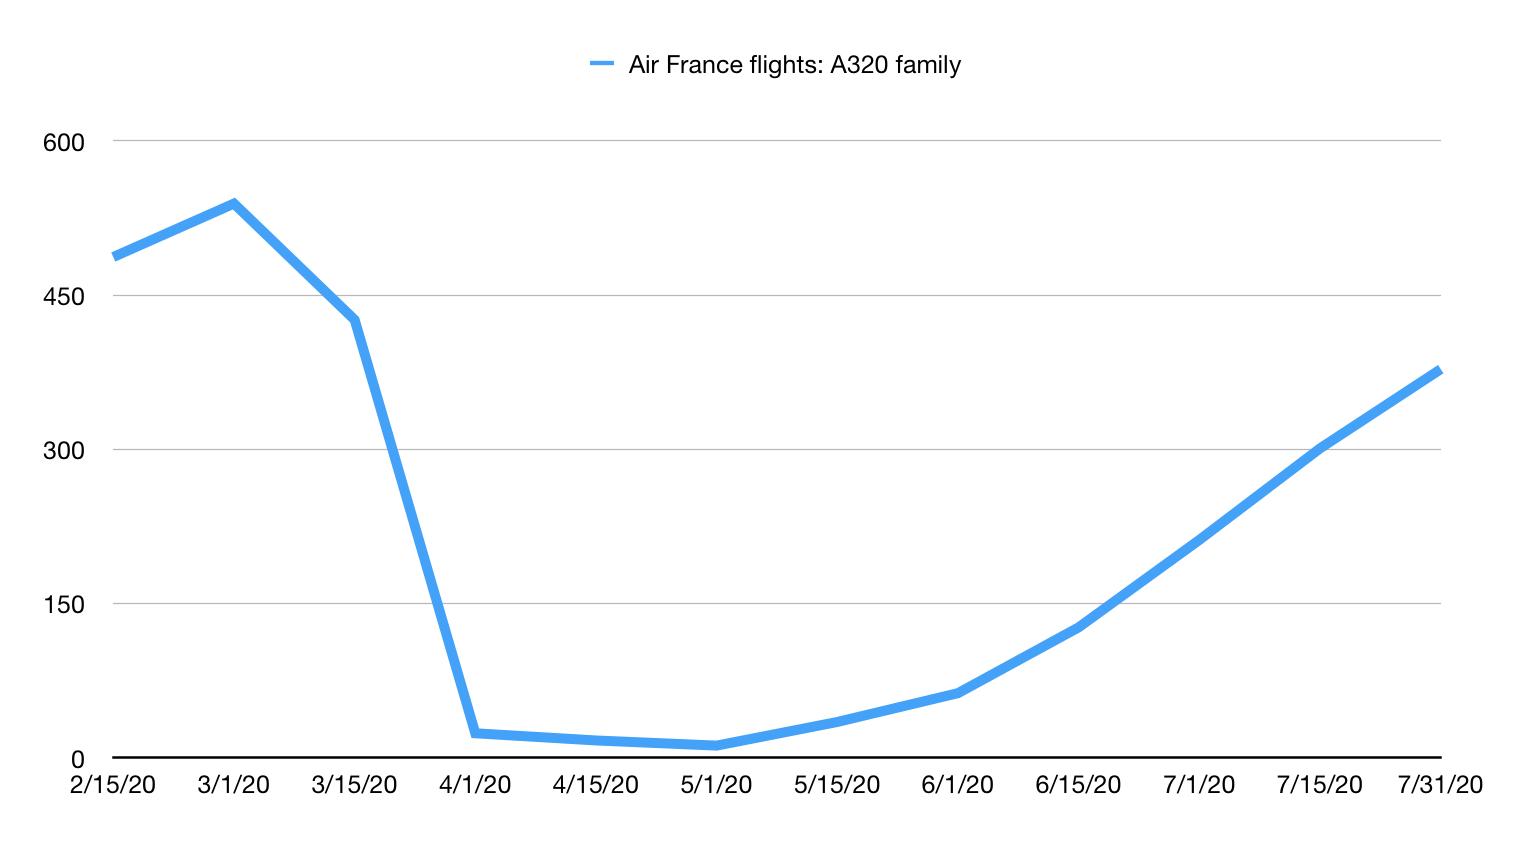 Air France A320 family flights graph